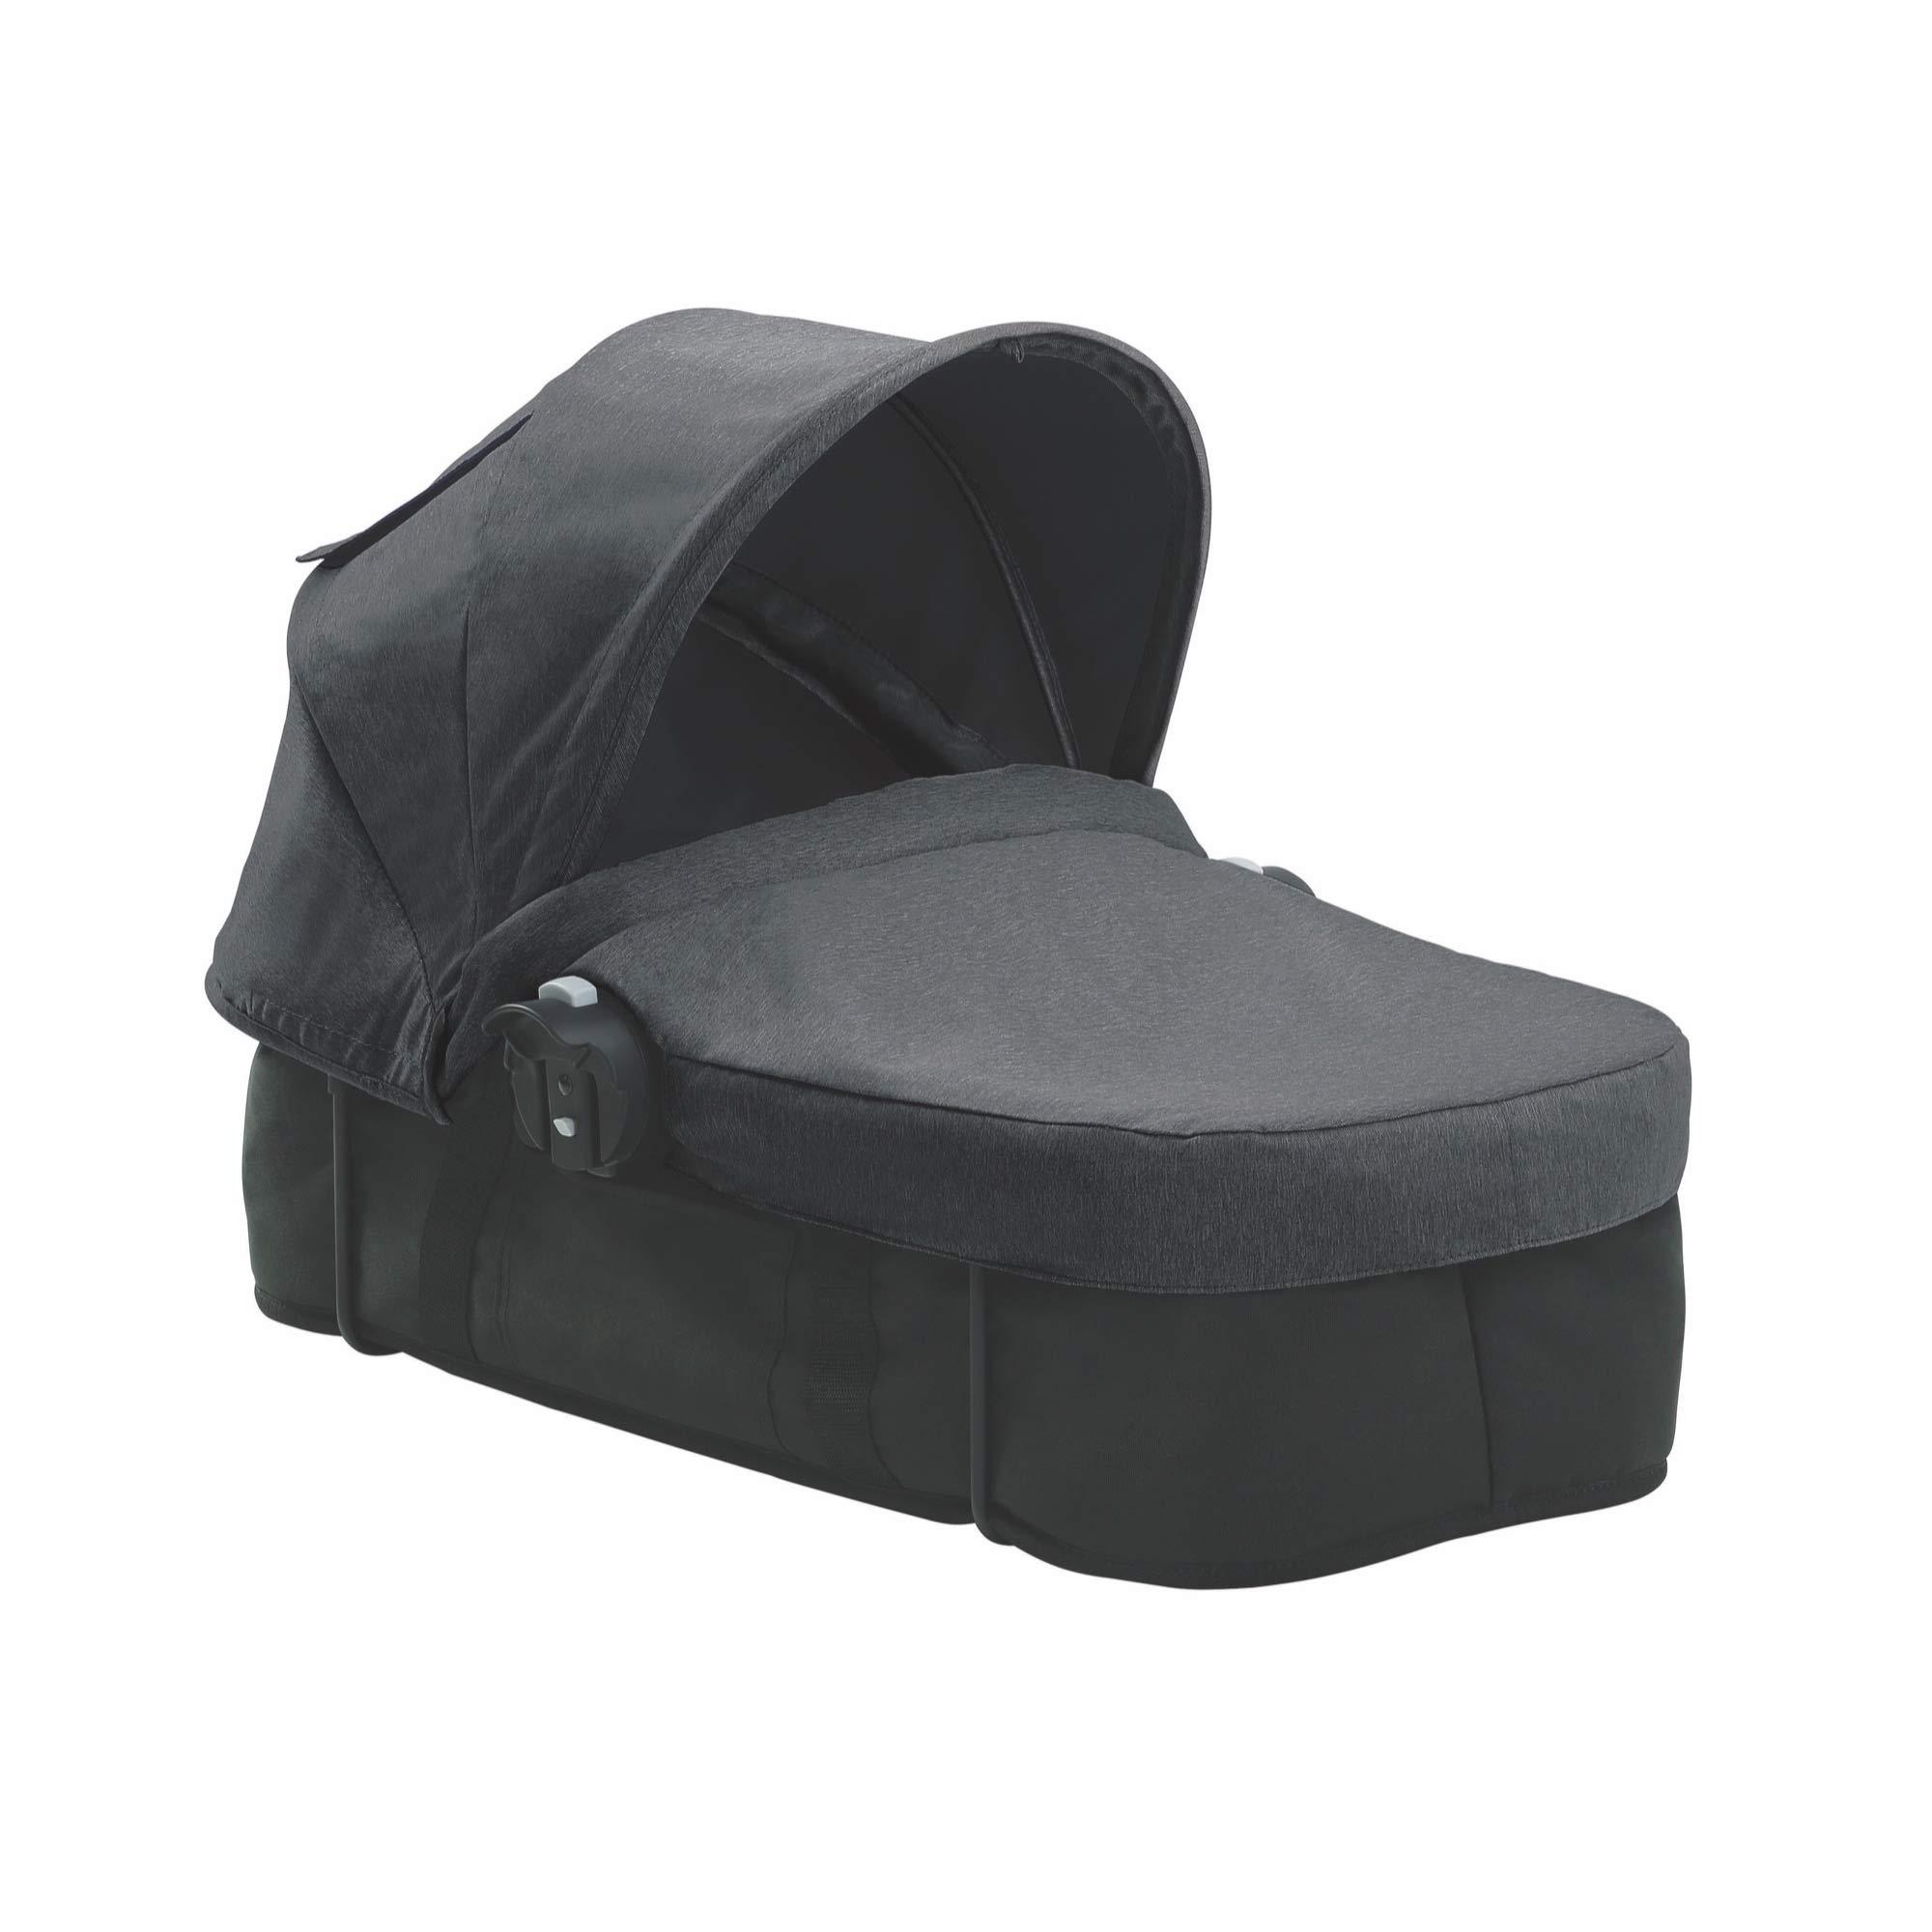 Baby Jogger City Select Pram Kit, Jet